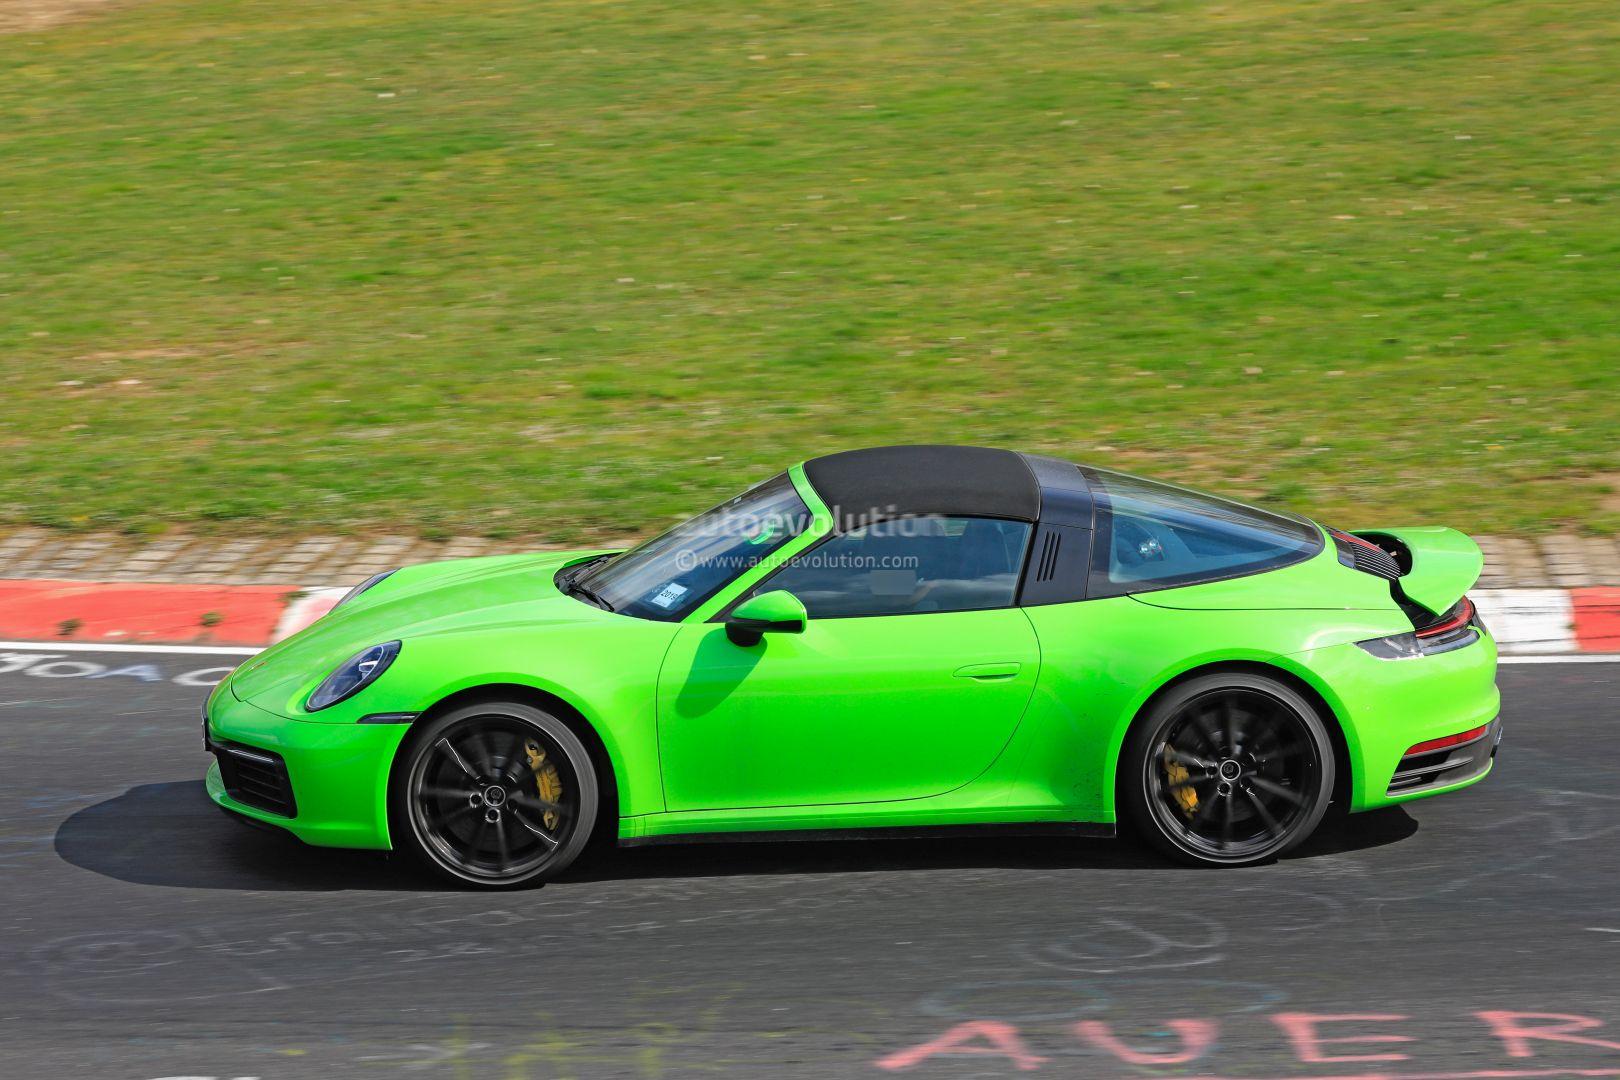 New Porsche 911 Targa 992 Spotted On Nurburgring Turbo Targa Rumors Grow Autoevolution